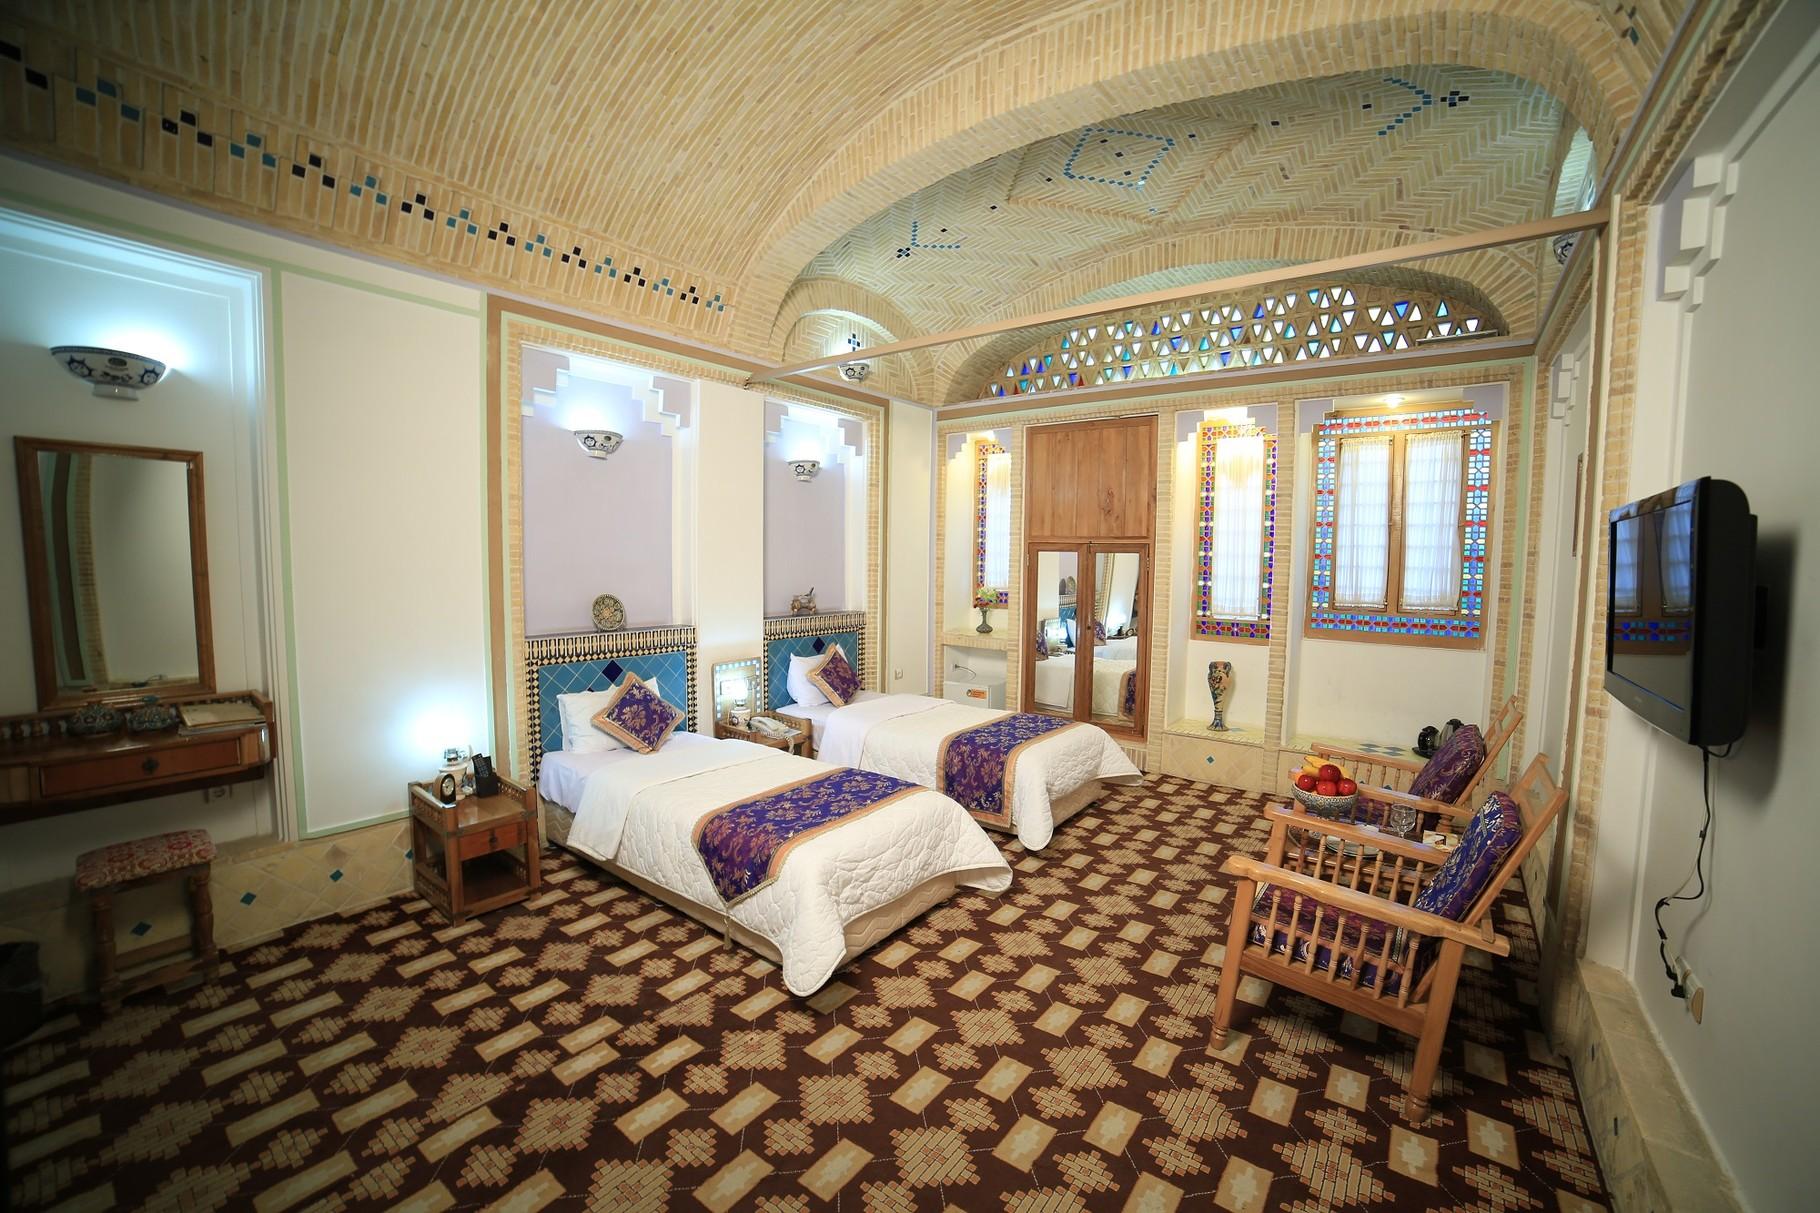 Four Star Hotel Gardenmoshir in Yazd